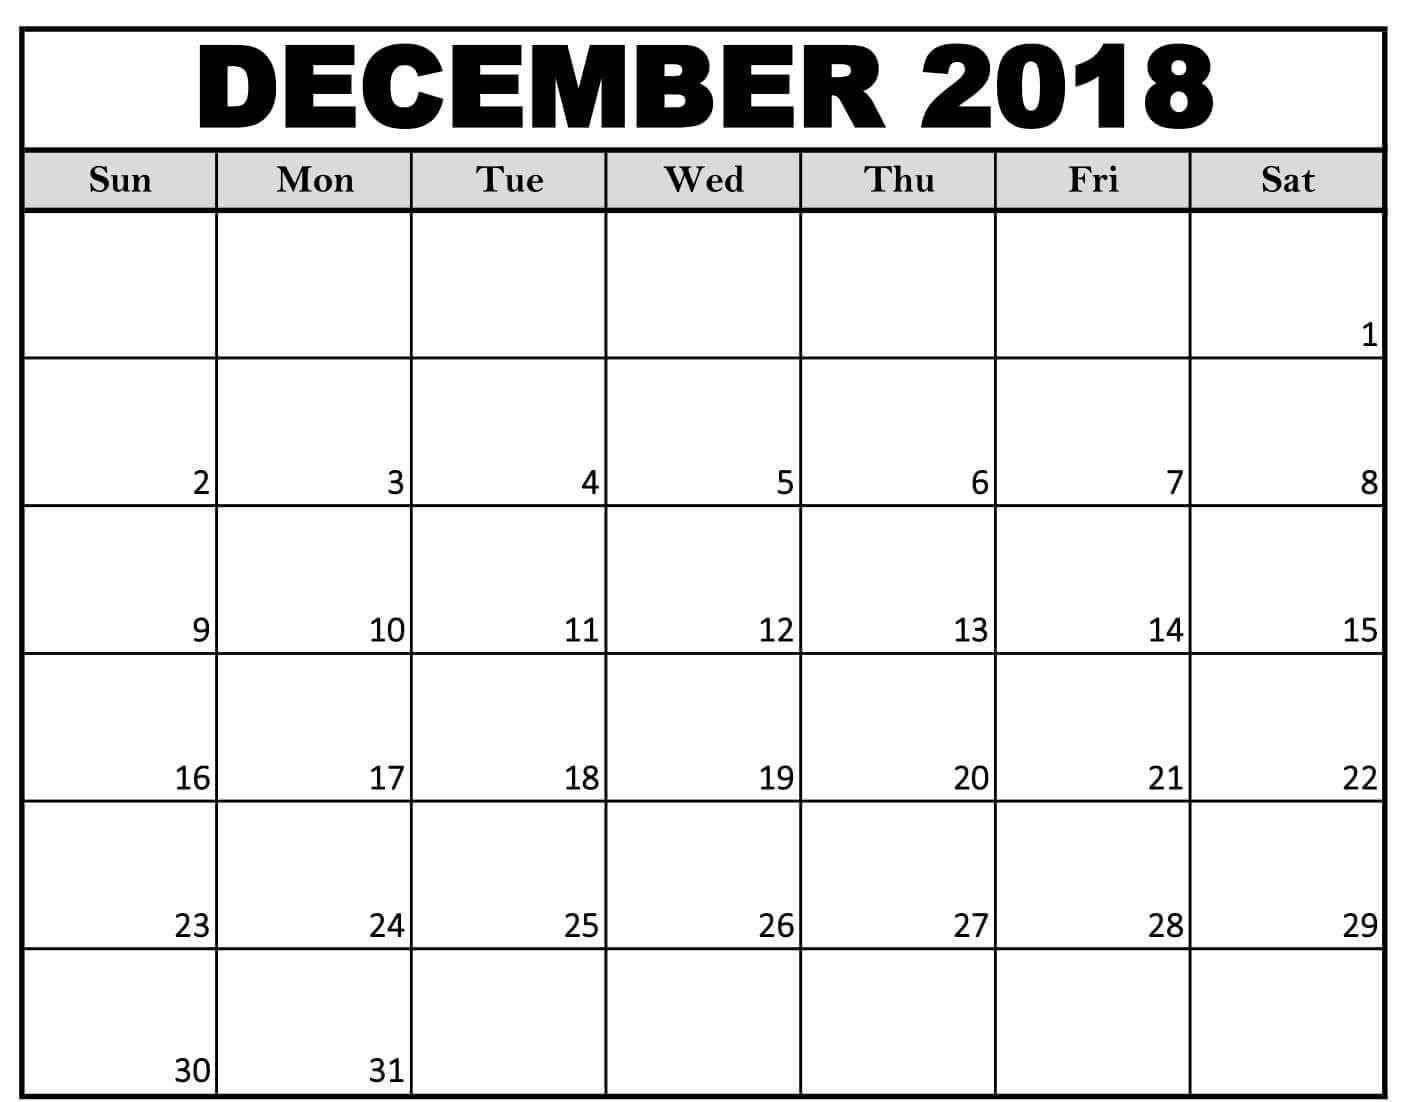 December 2018 Calendar Landscape #December2018Calendar # for Free Printable December January Calendar Graphics